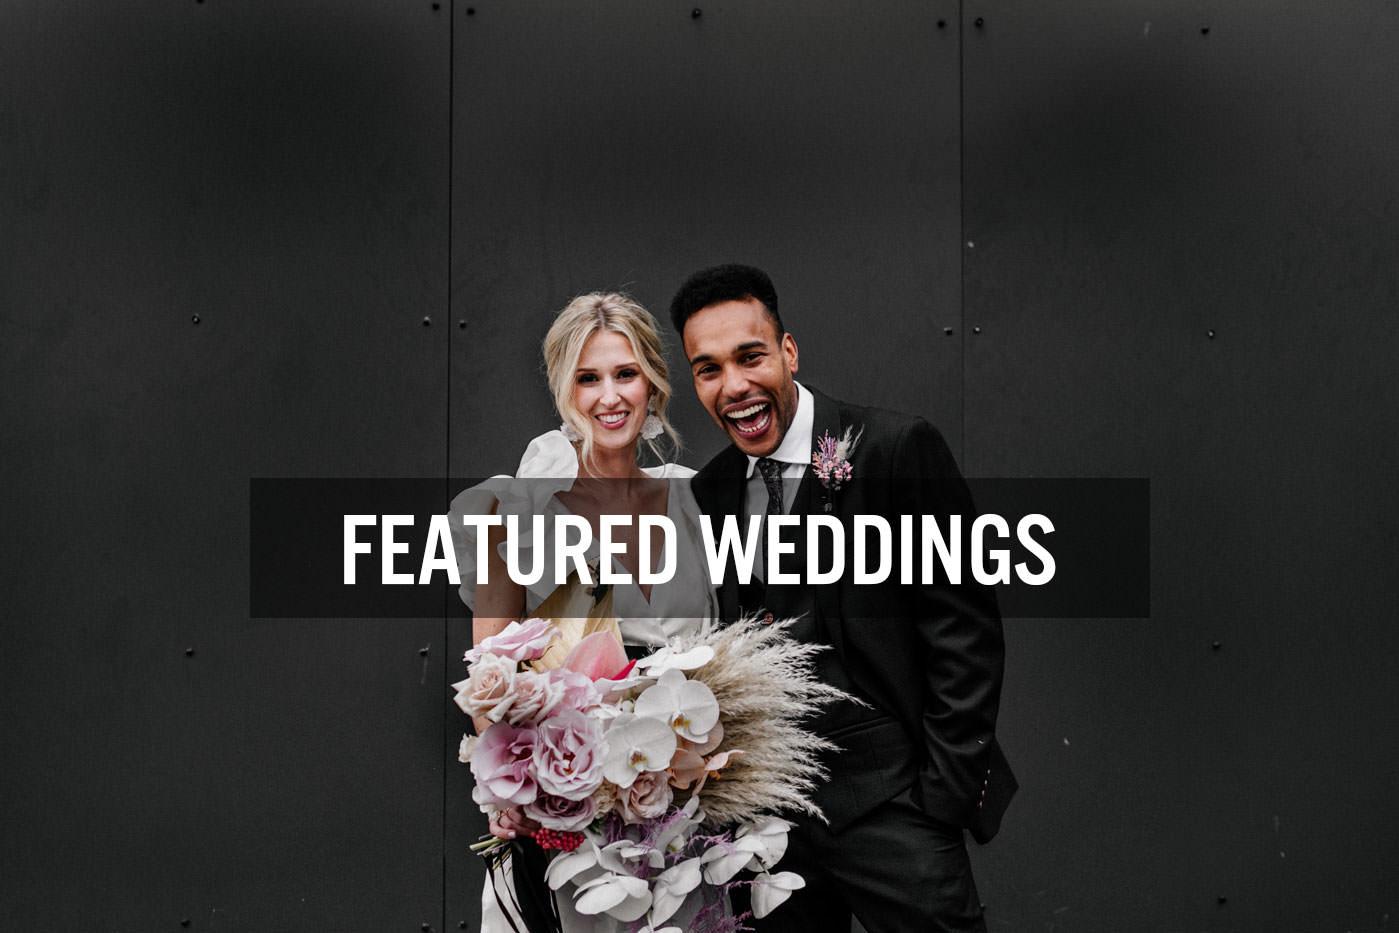 Stylish, modern wedding photography in London